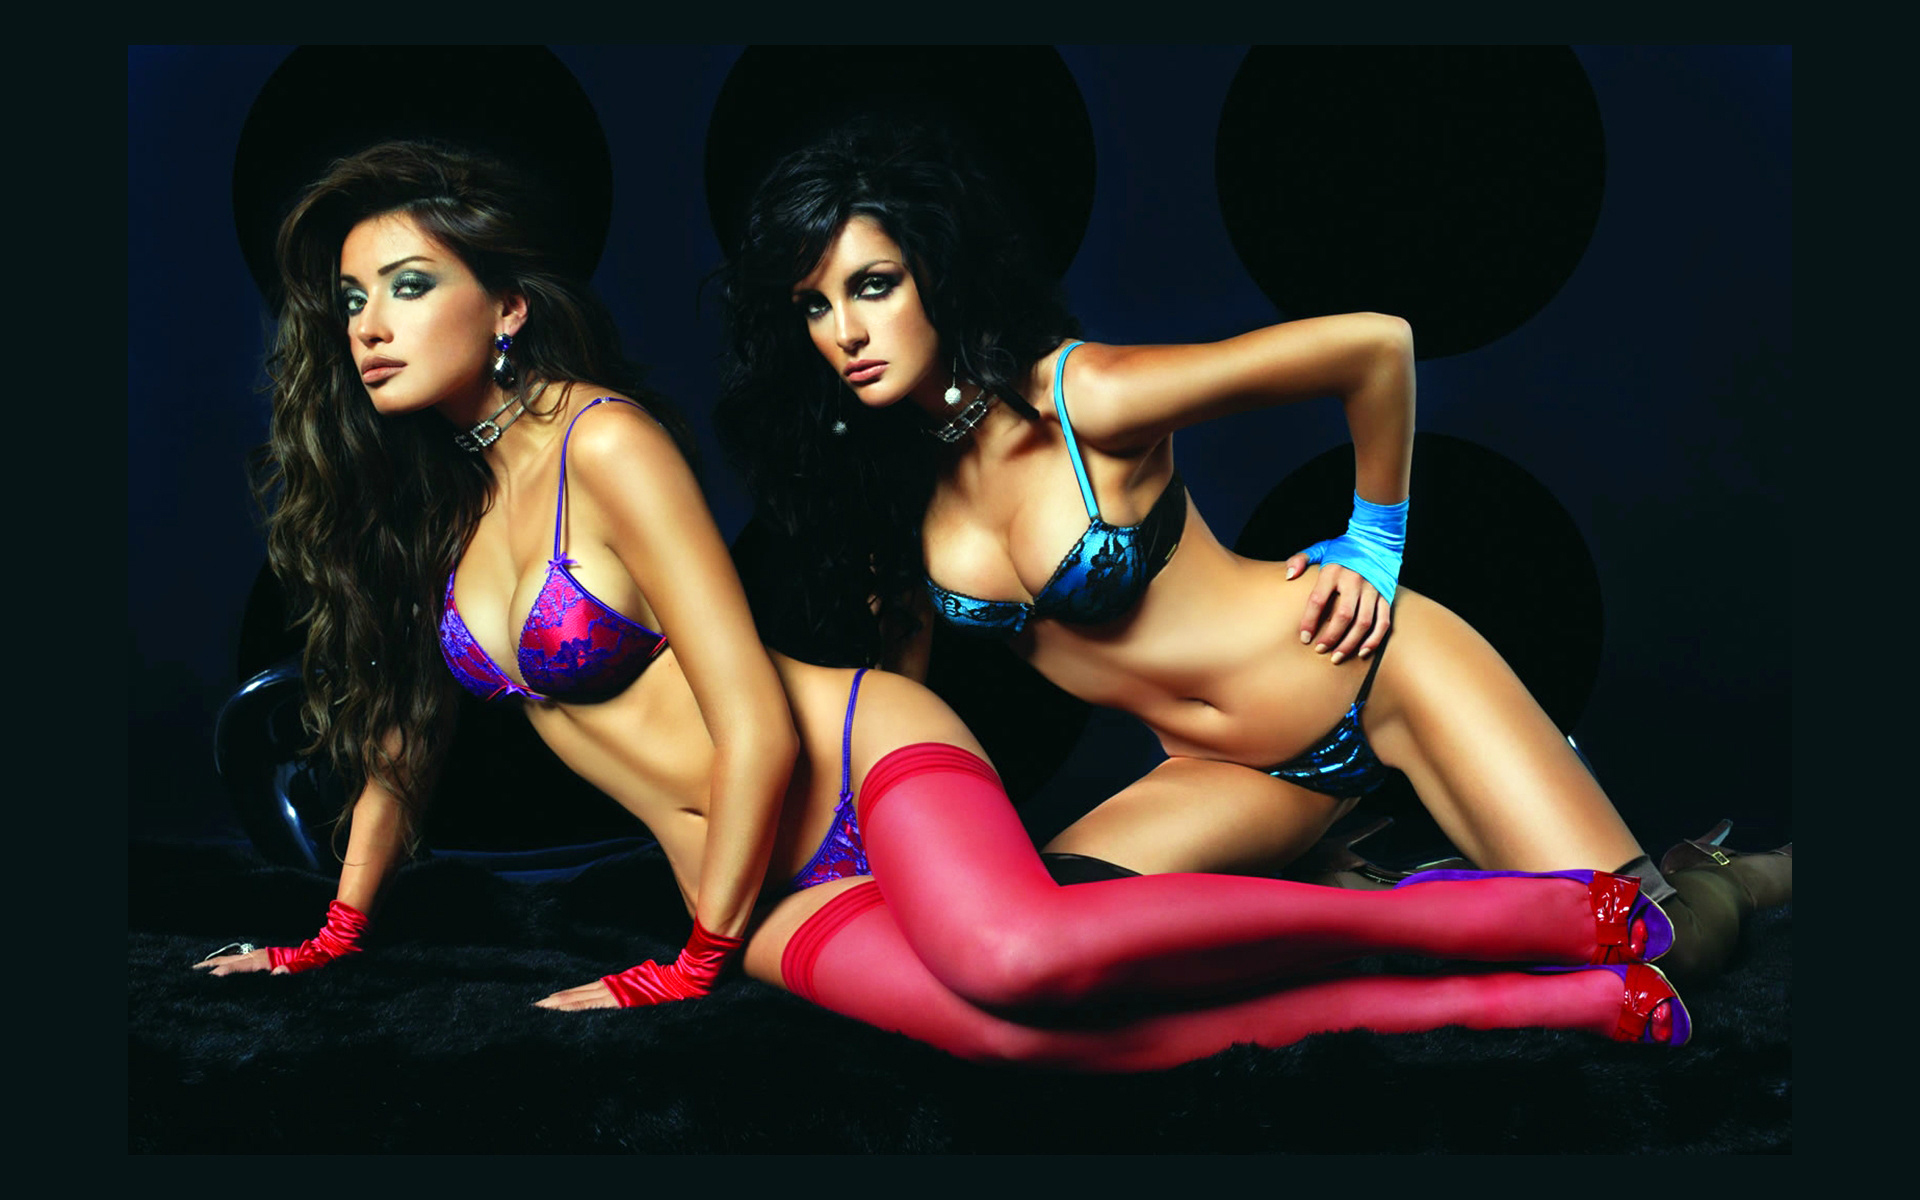 массажистки порно лесбиянки